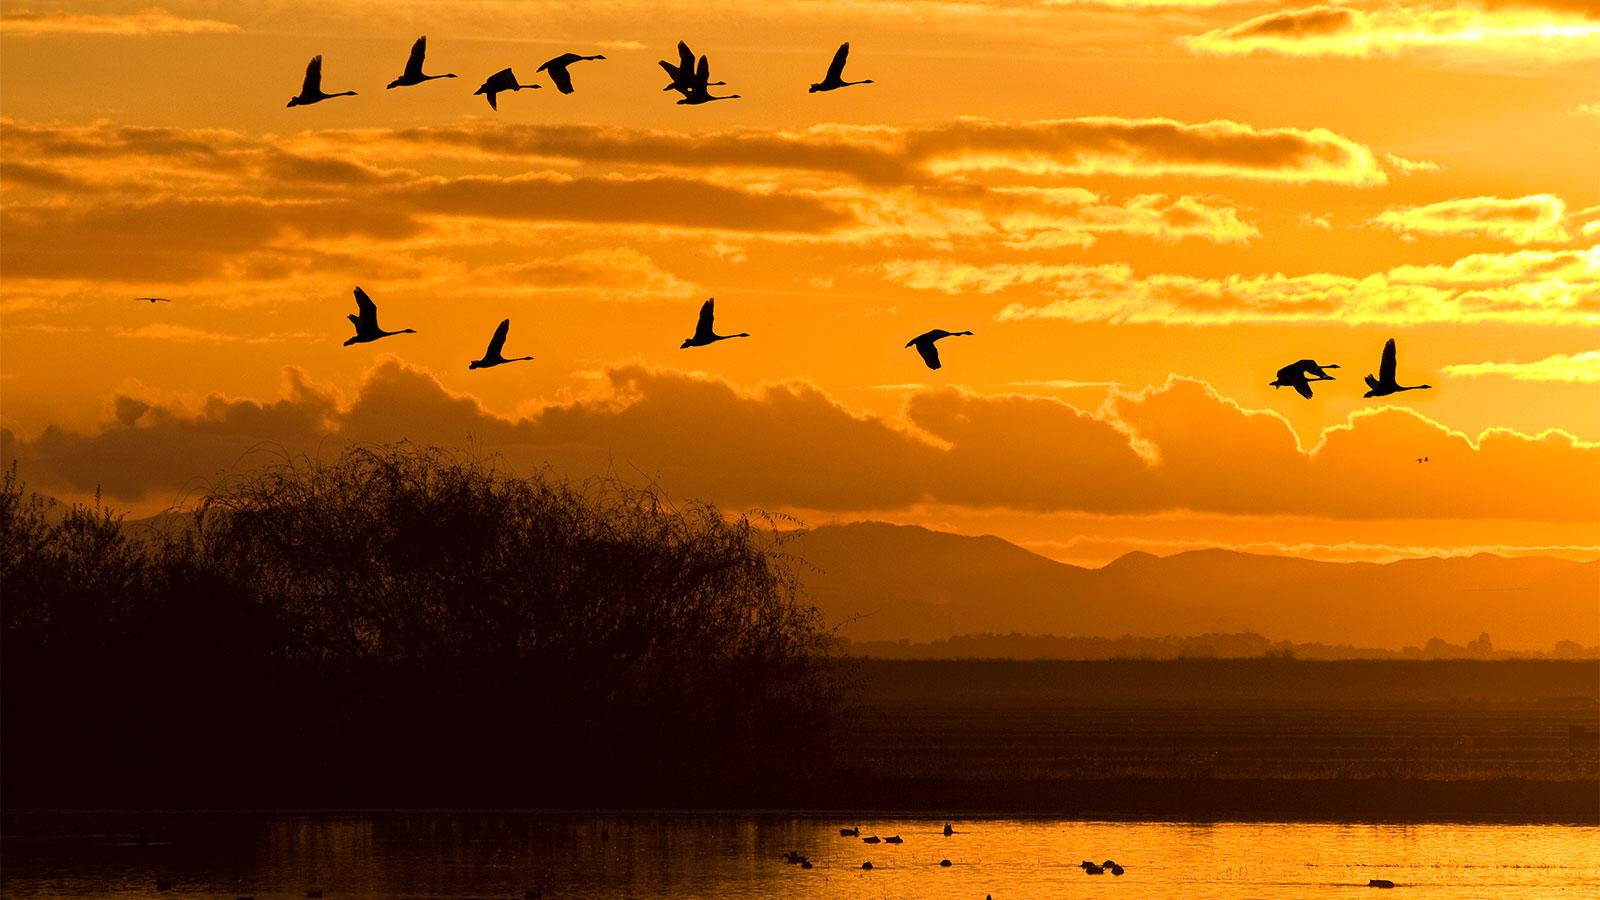 Migratory birds flying against an orange sunset